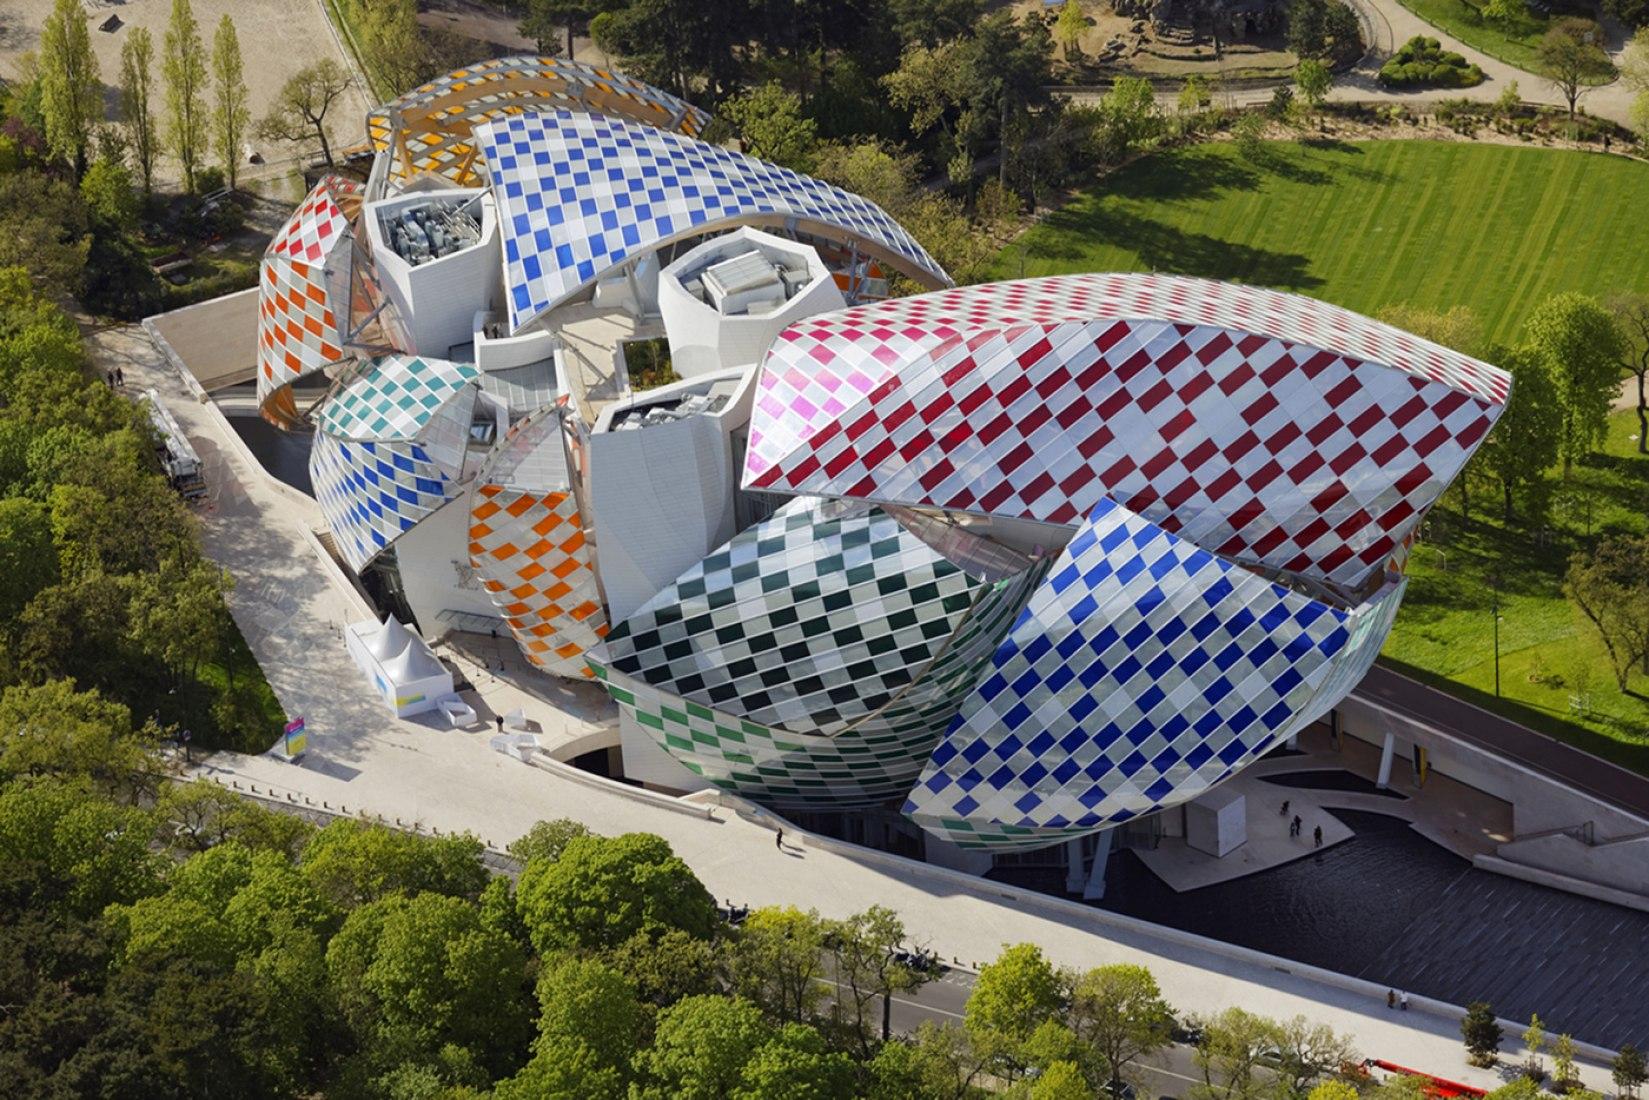 "Daniel Buren, ""Observatorio de la Luz"", obra in situ, Fundación Louis Vuitton, Paris, 2016. Fotografía © Philippe Guignard / DB-ADAGP Paris / Air Images. Cortesía de la Fundación Louis Vuitton"